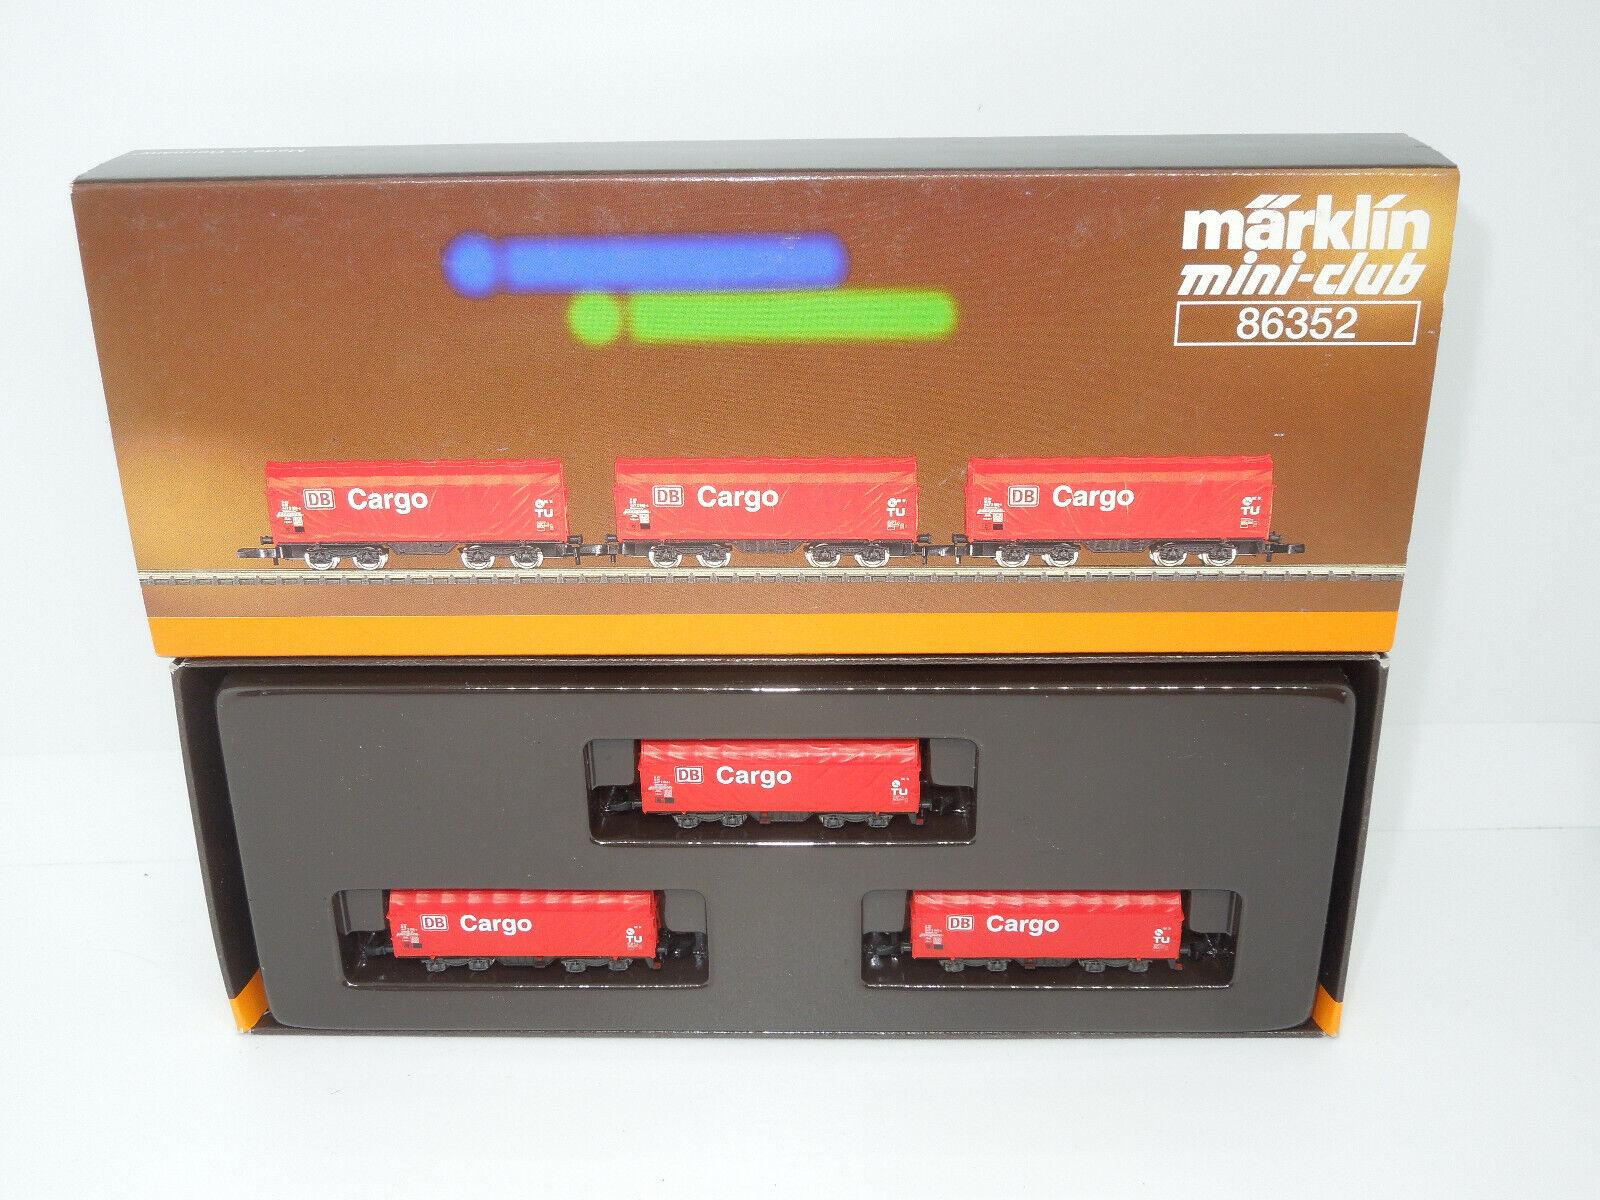 marklin miniclub 86352 PIANO SCORREVOLE Wagenset DB autoGO